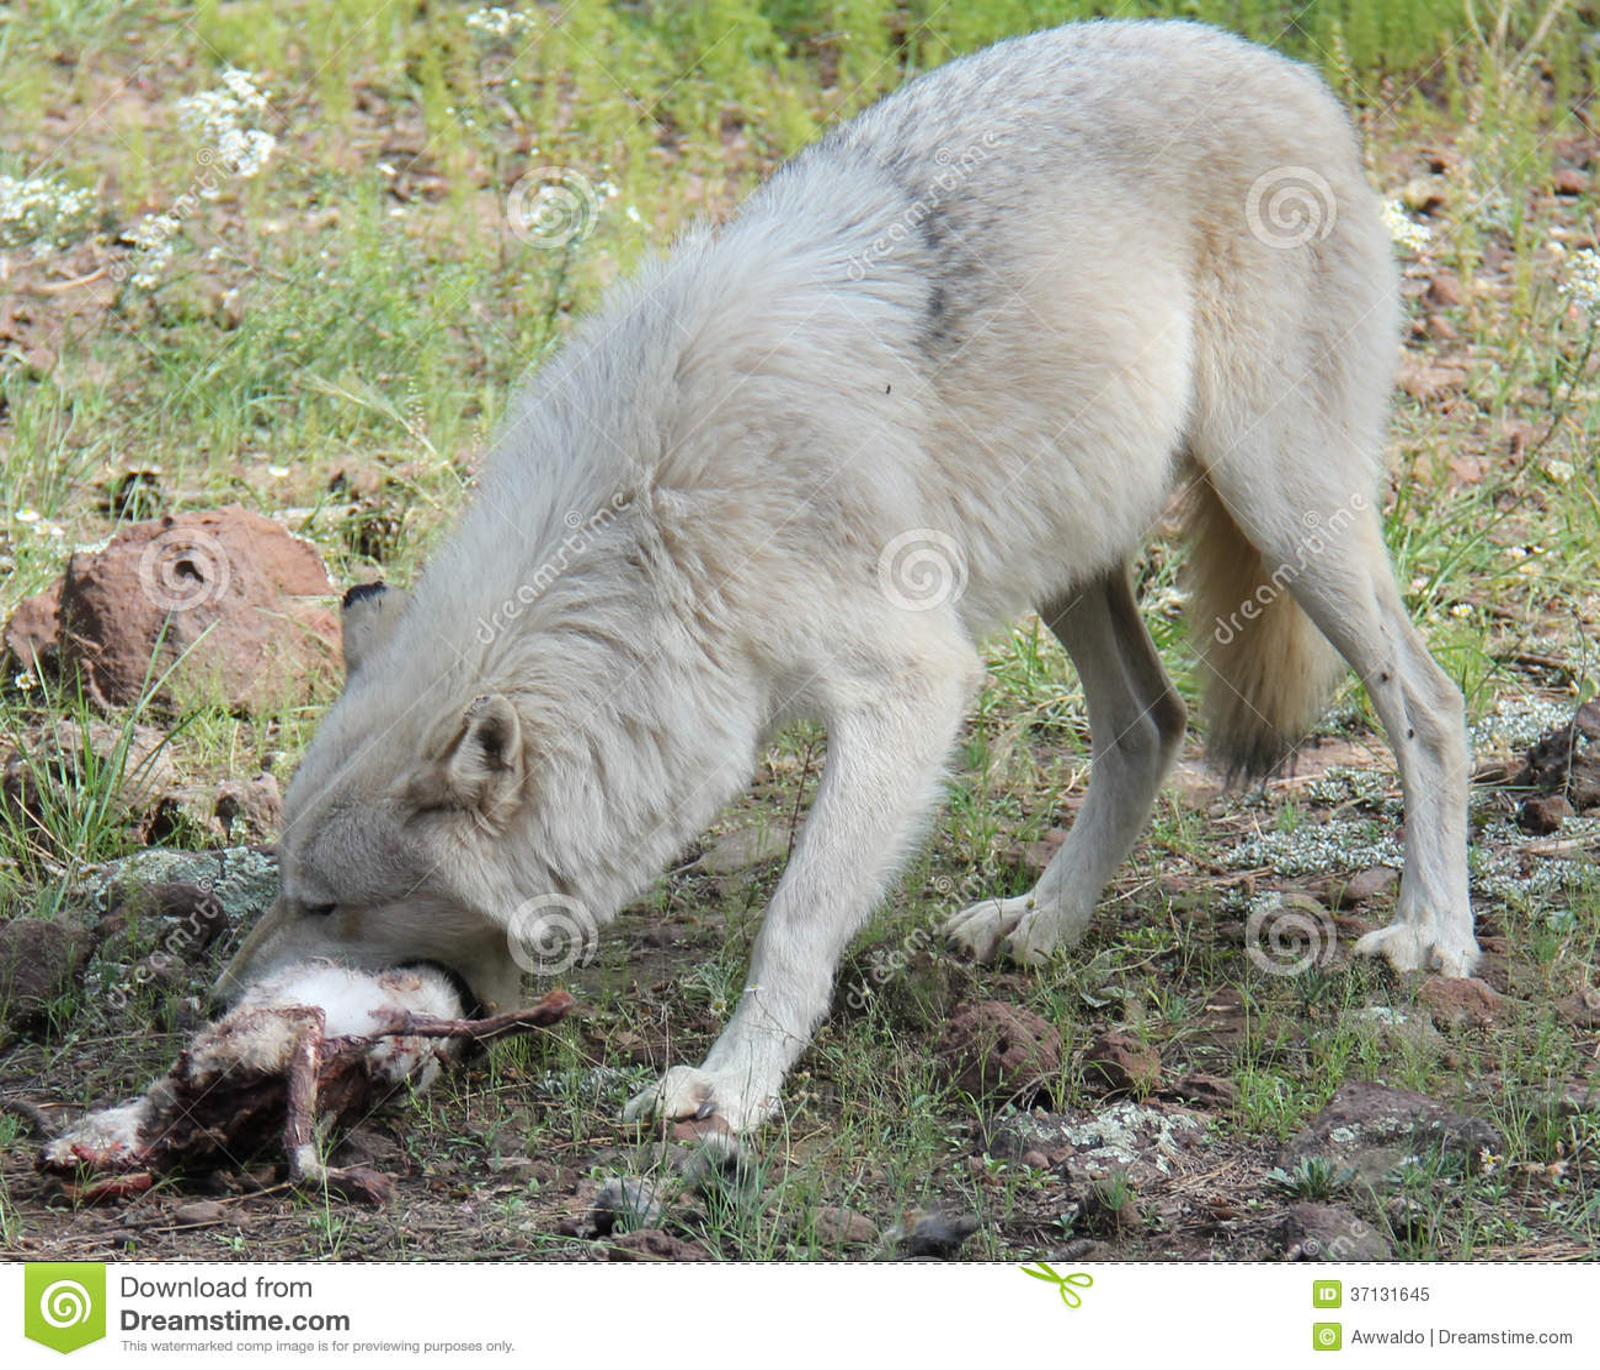 Wolf eating rabbit - photo#3